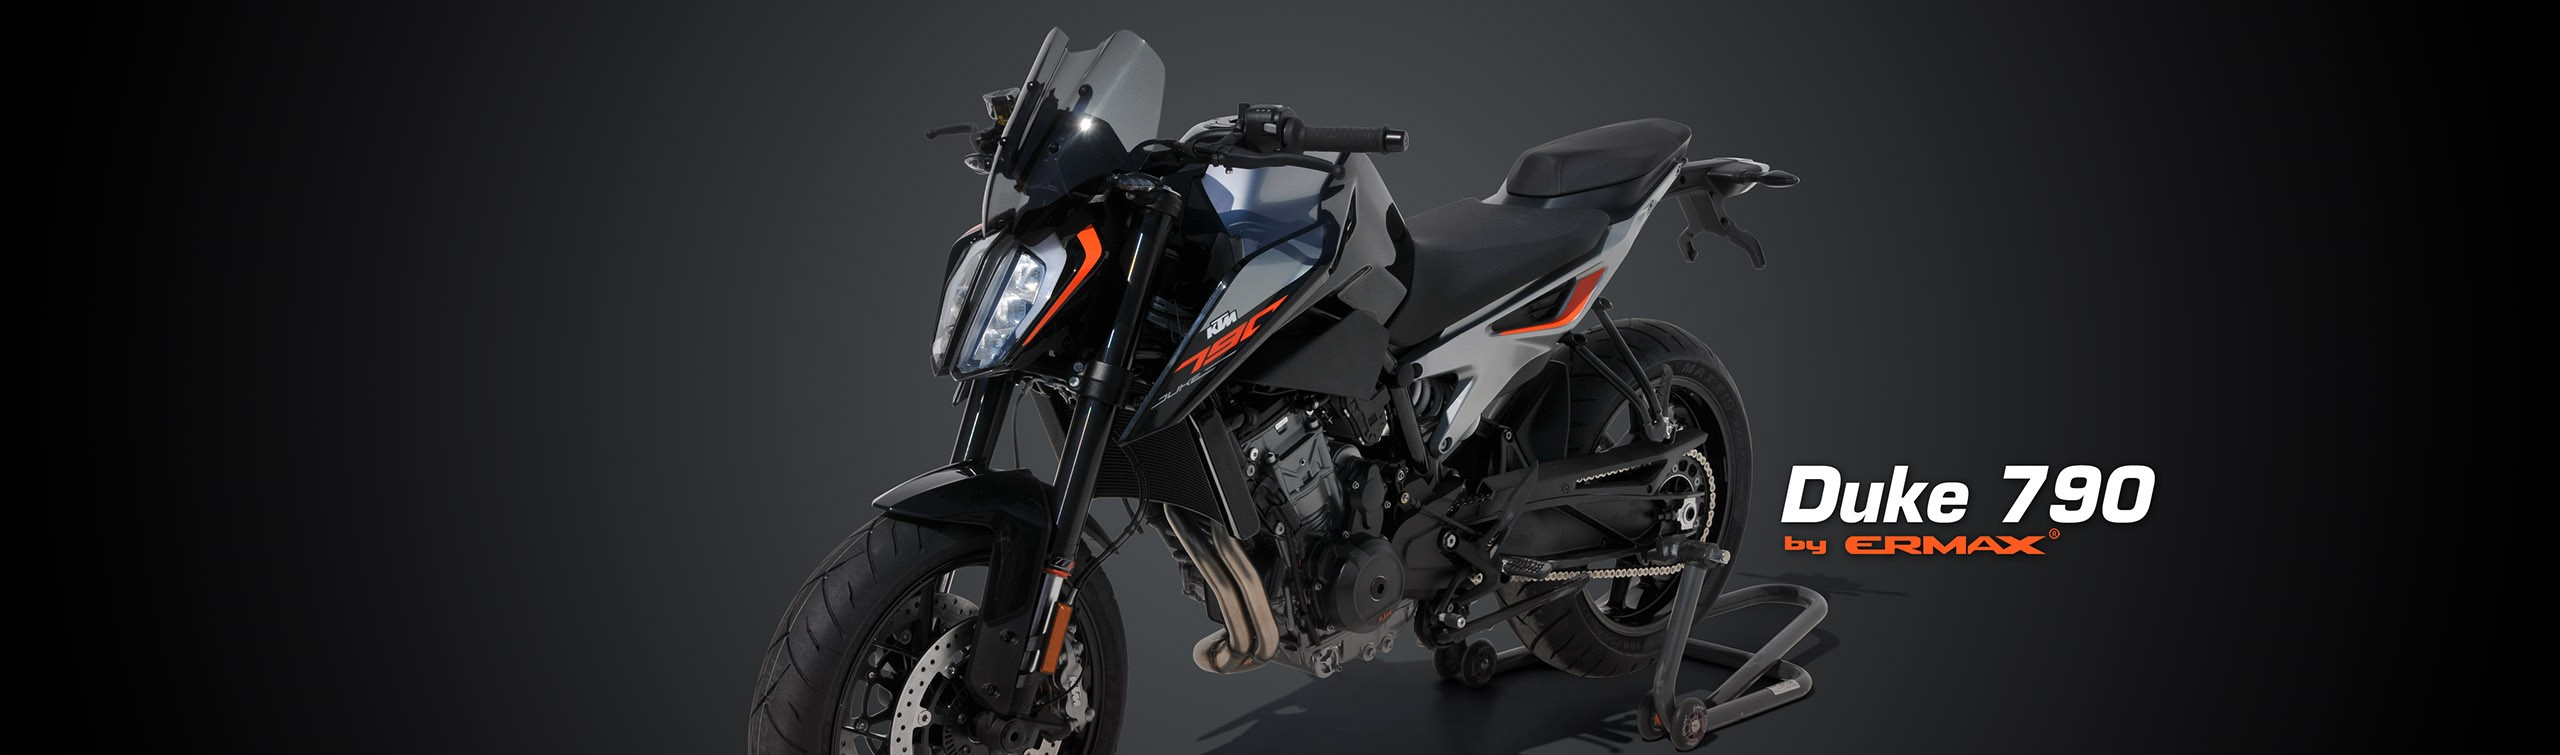 KTM 790 Duke by Ermax